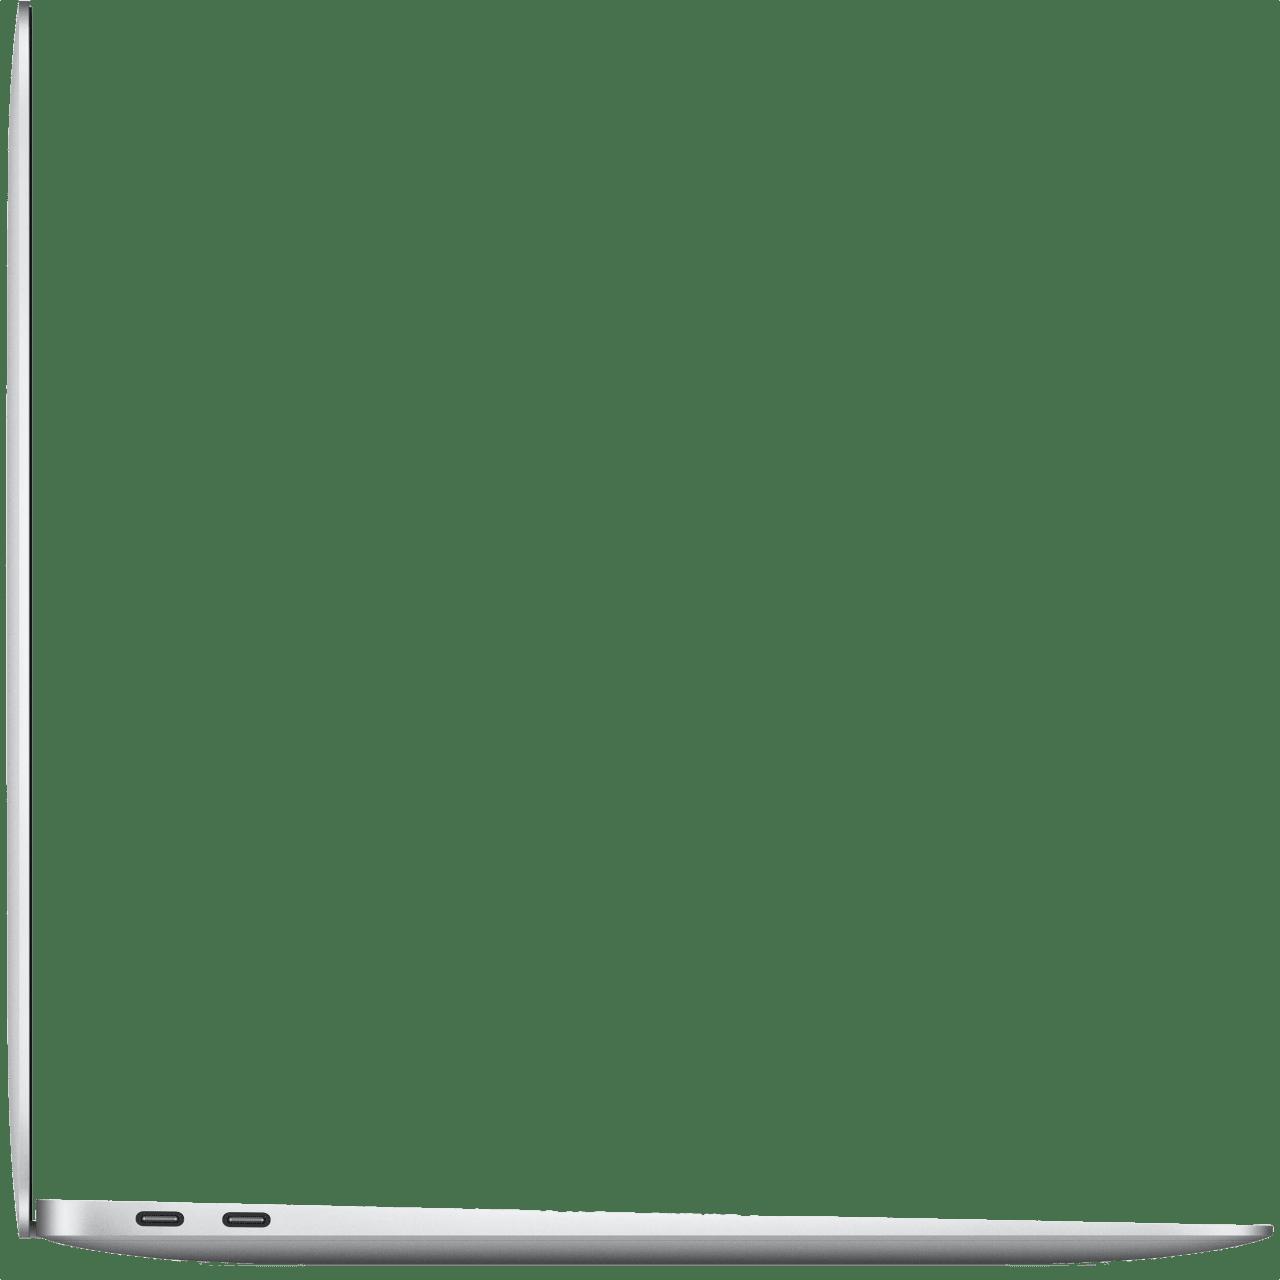 Silver Apple MacBook Air (Late 2020) - English (QWERTY) Laptop - Apple M1 - 16GB - 256GB SSD - Apple Integrated 7-core GPU.3